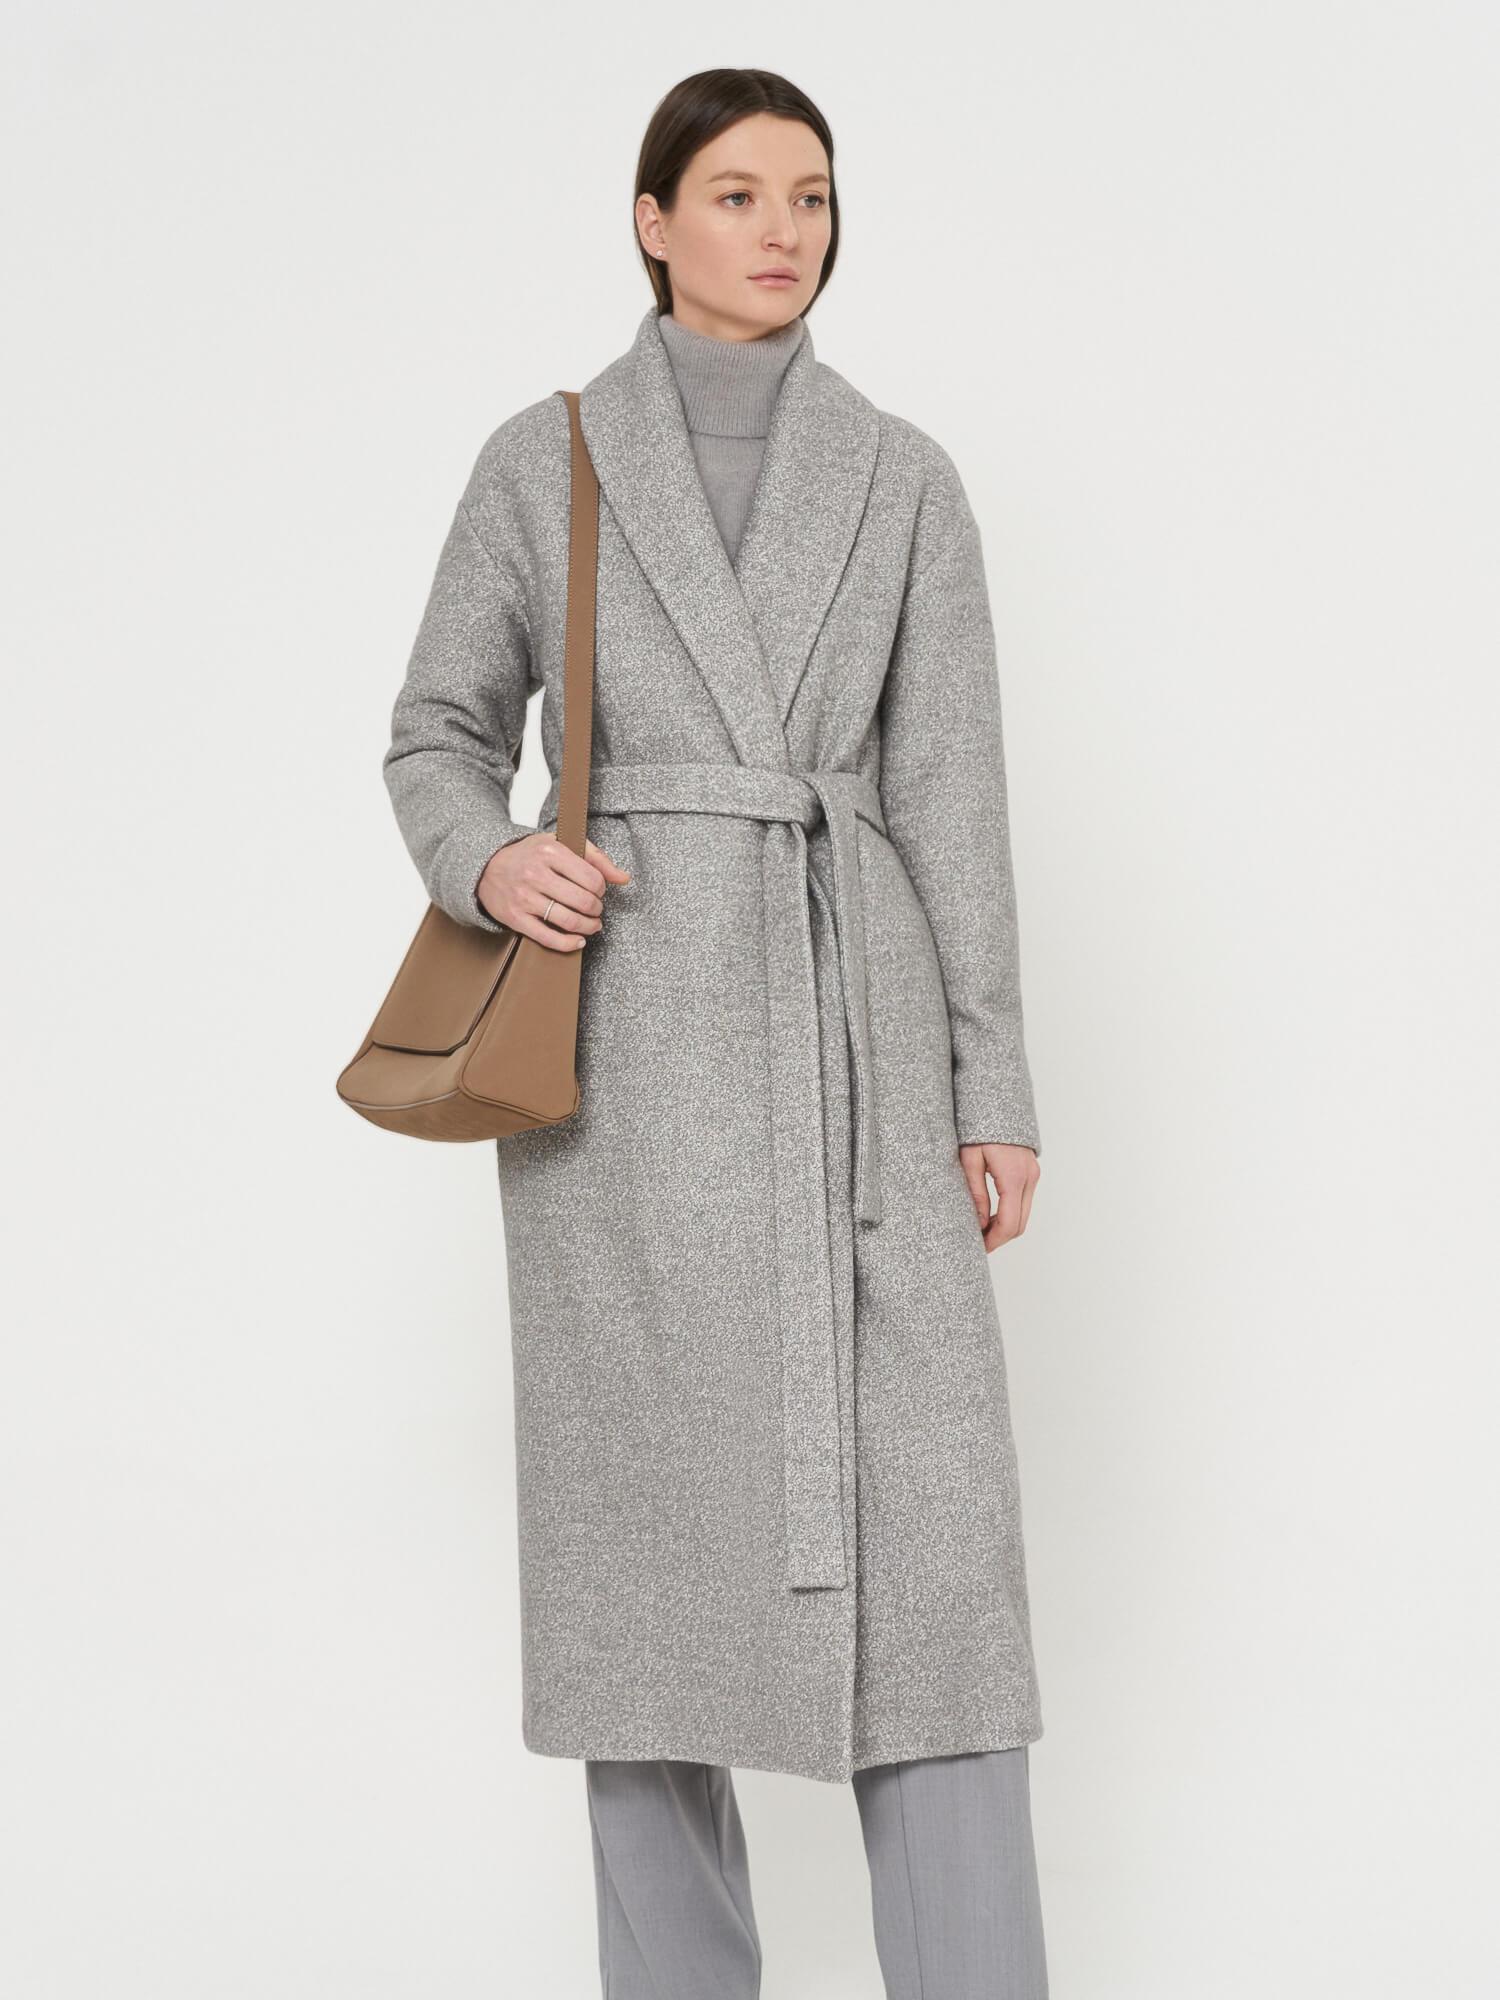 Пальто-кардиган Иокогама